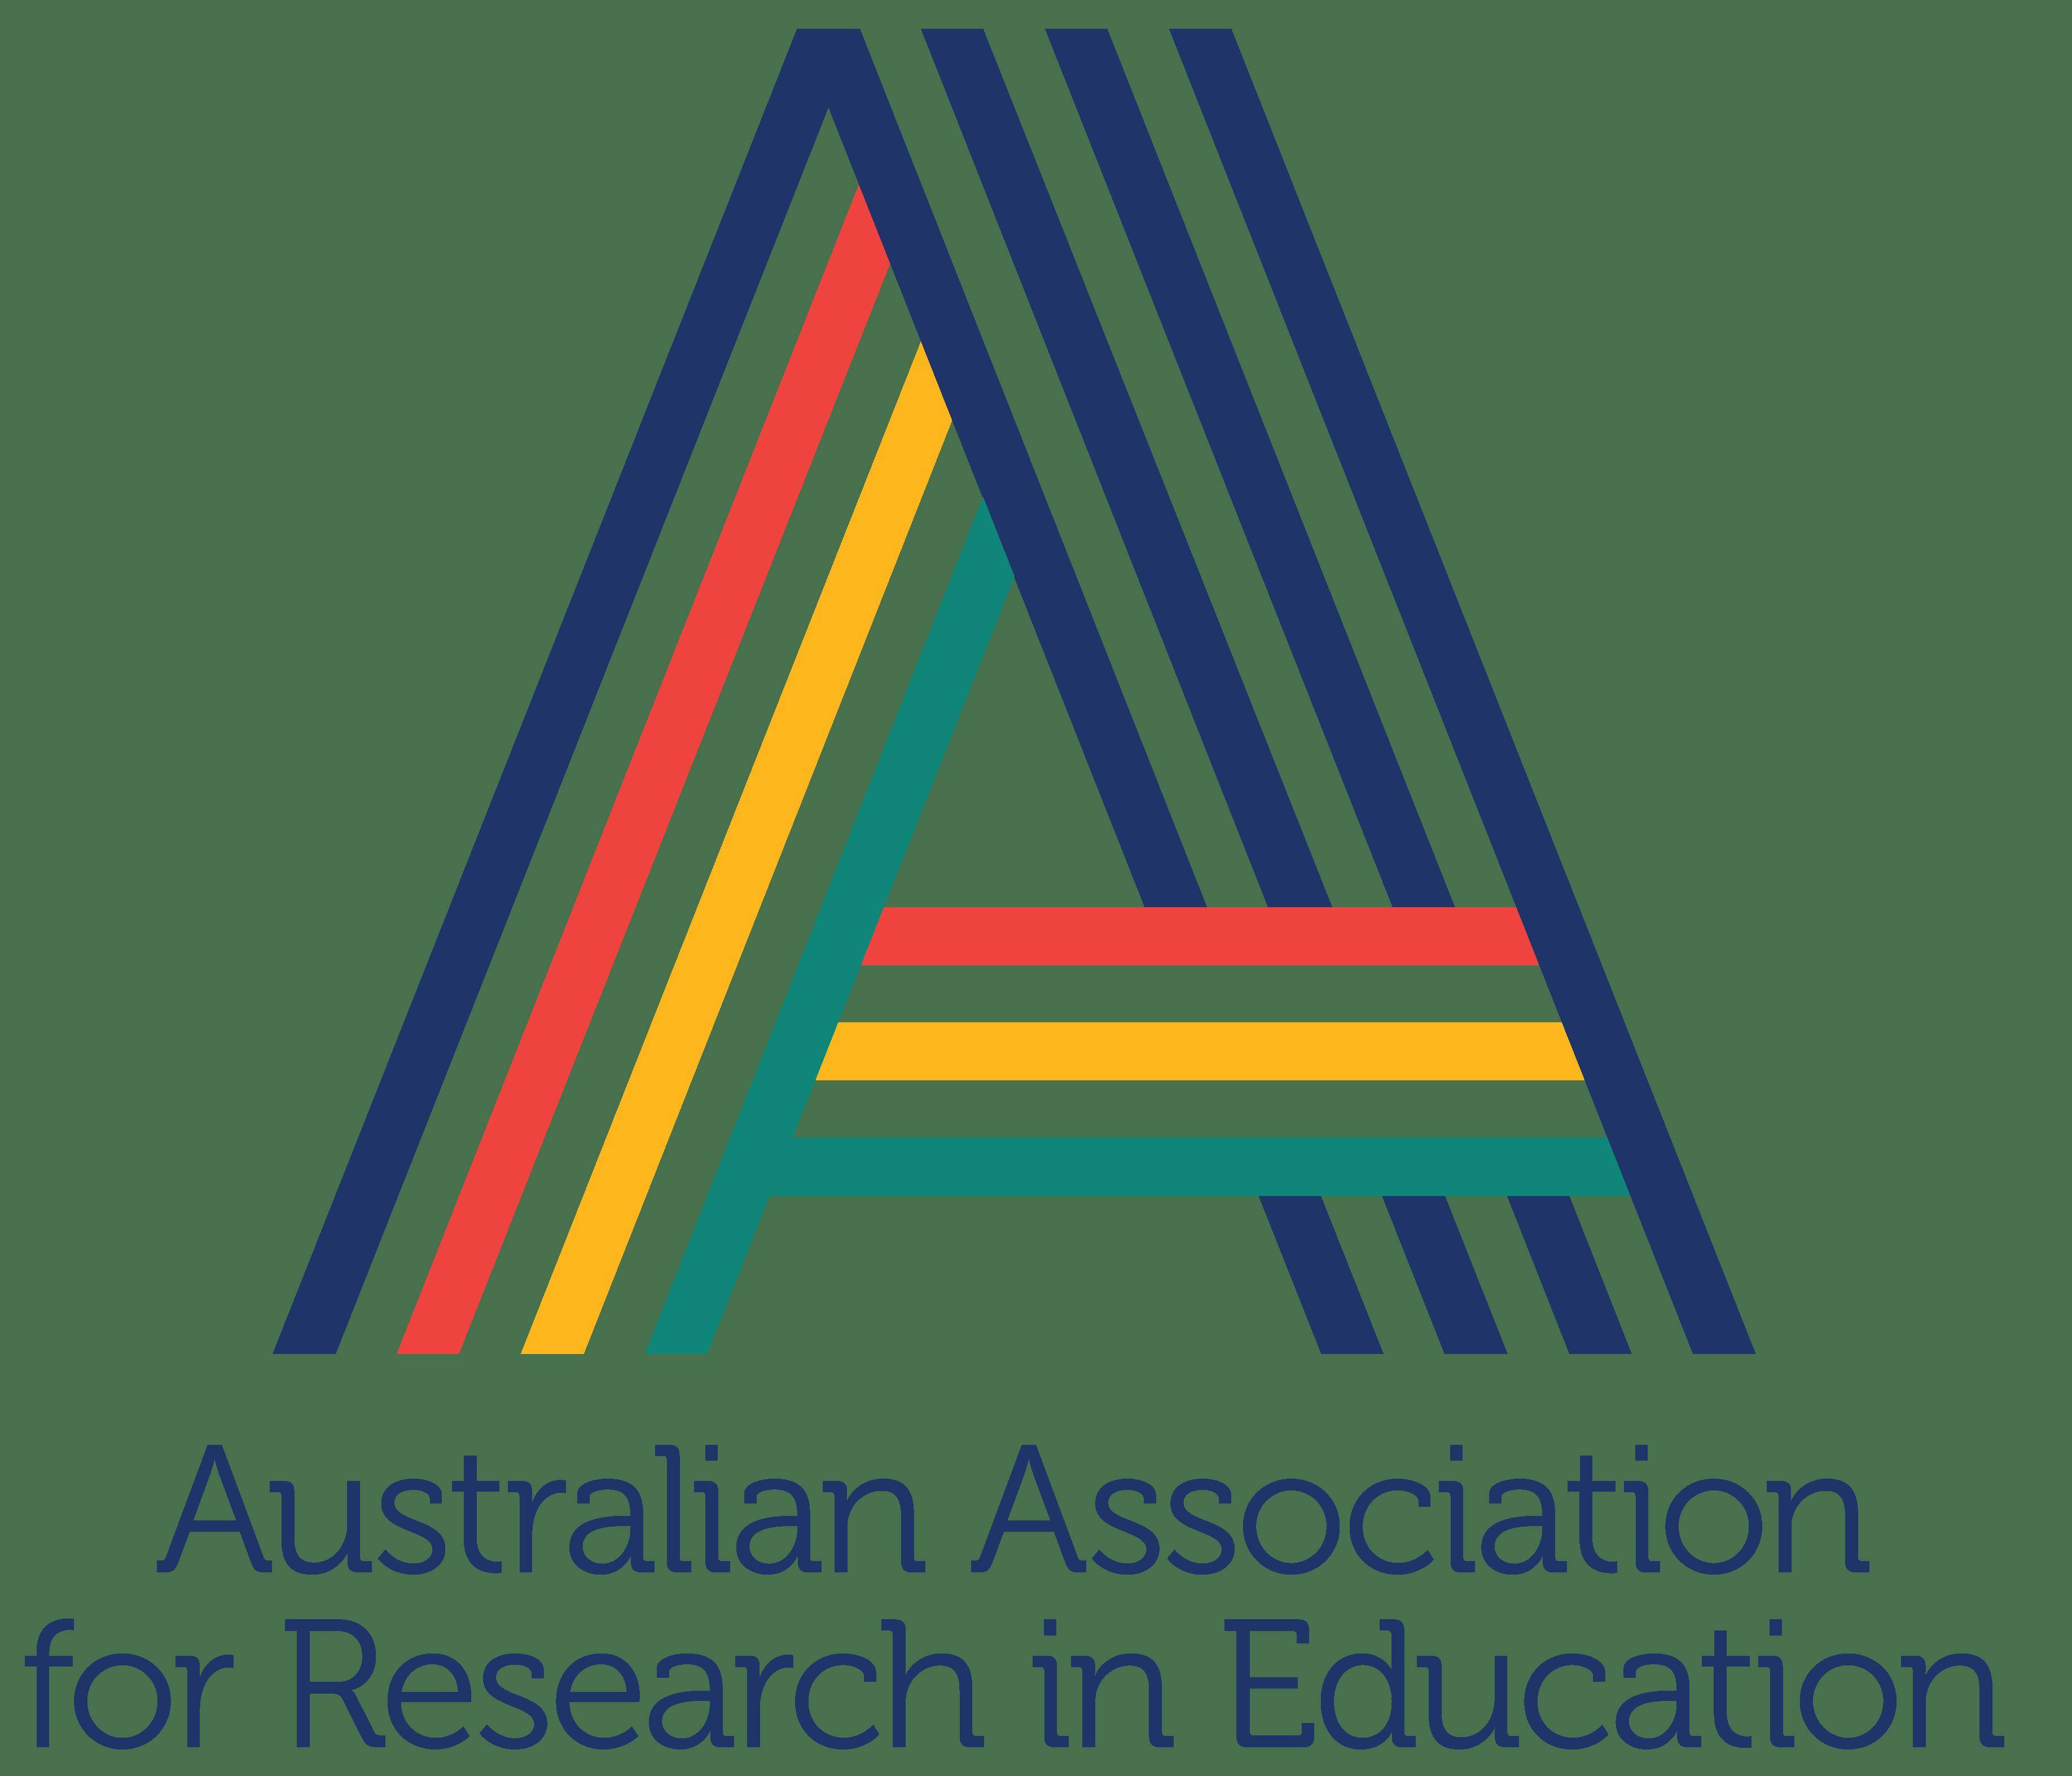 Australian Association for Research in Education logo